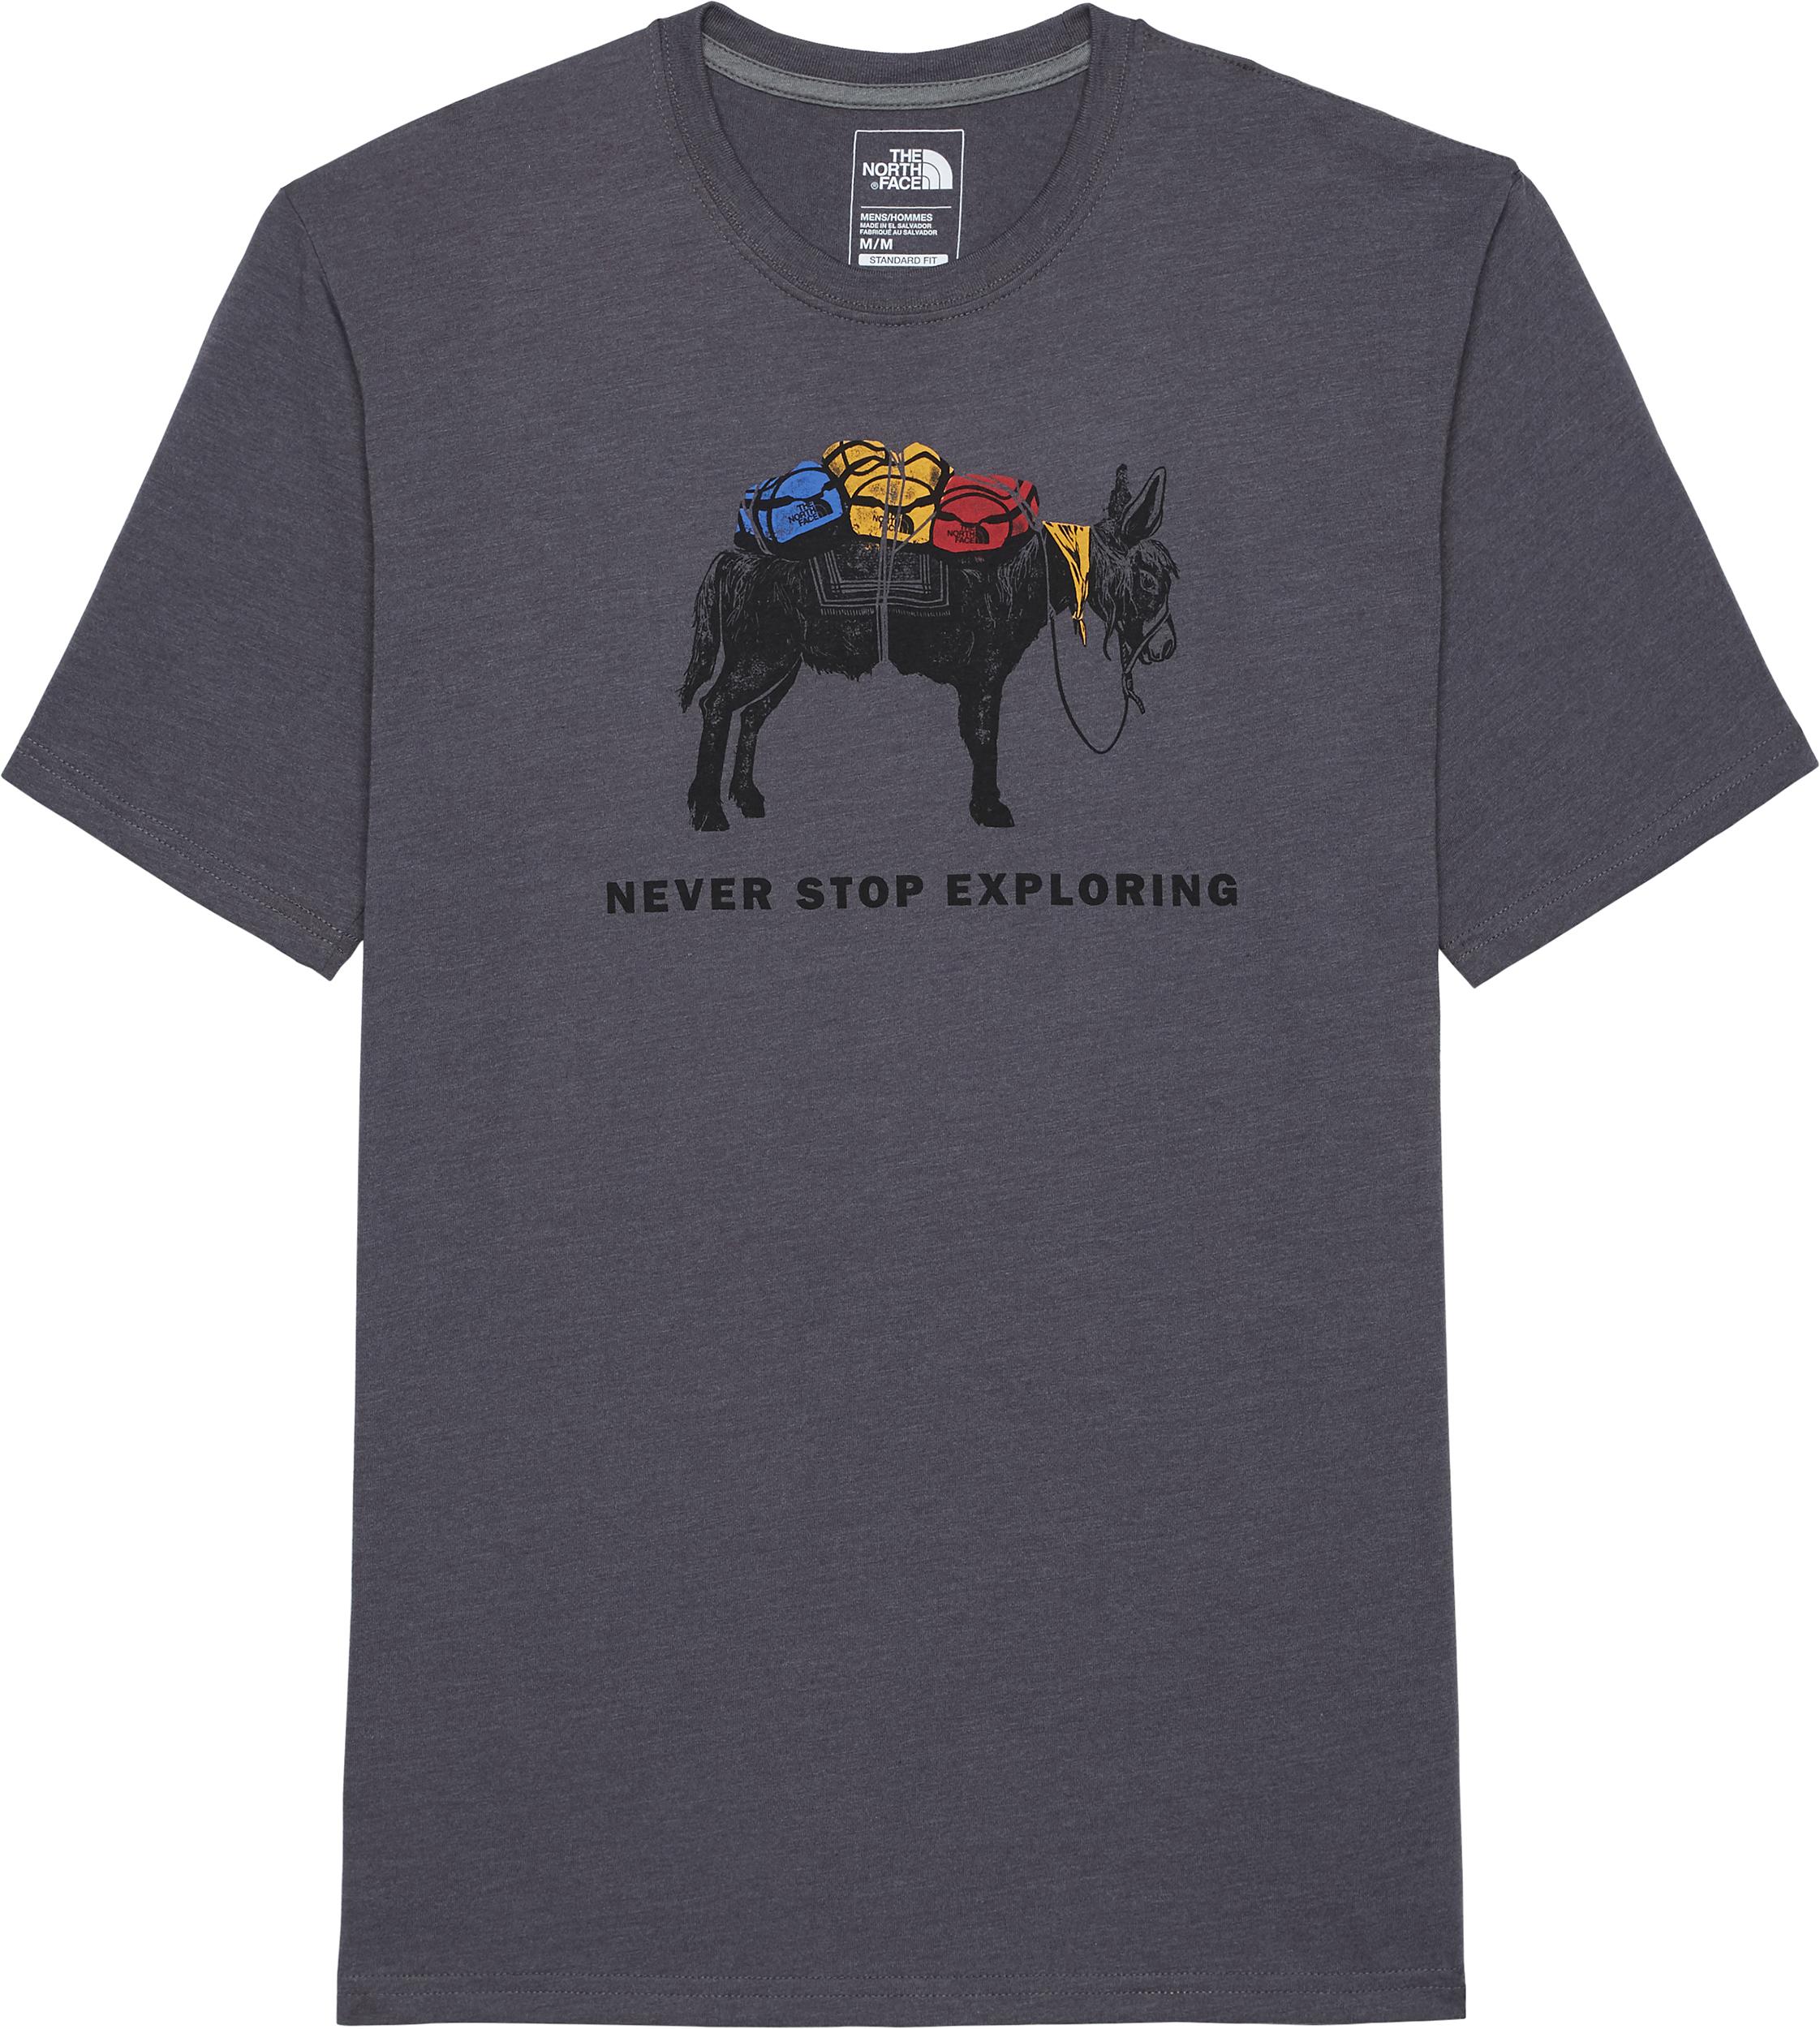 e62c14eb9 Men's Shirts and tops | MEC